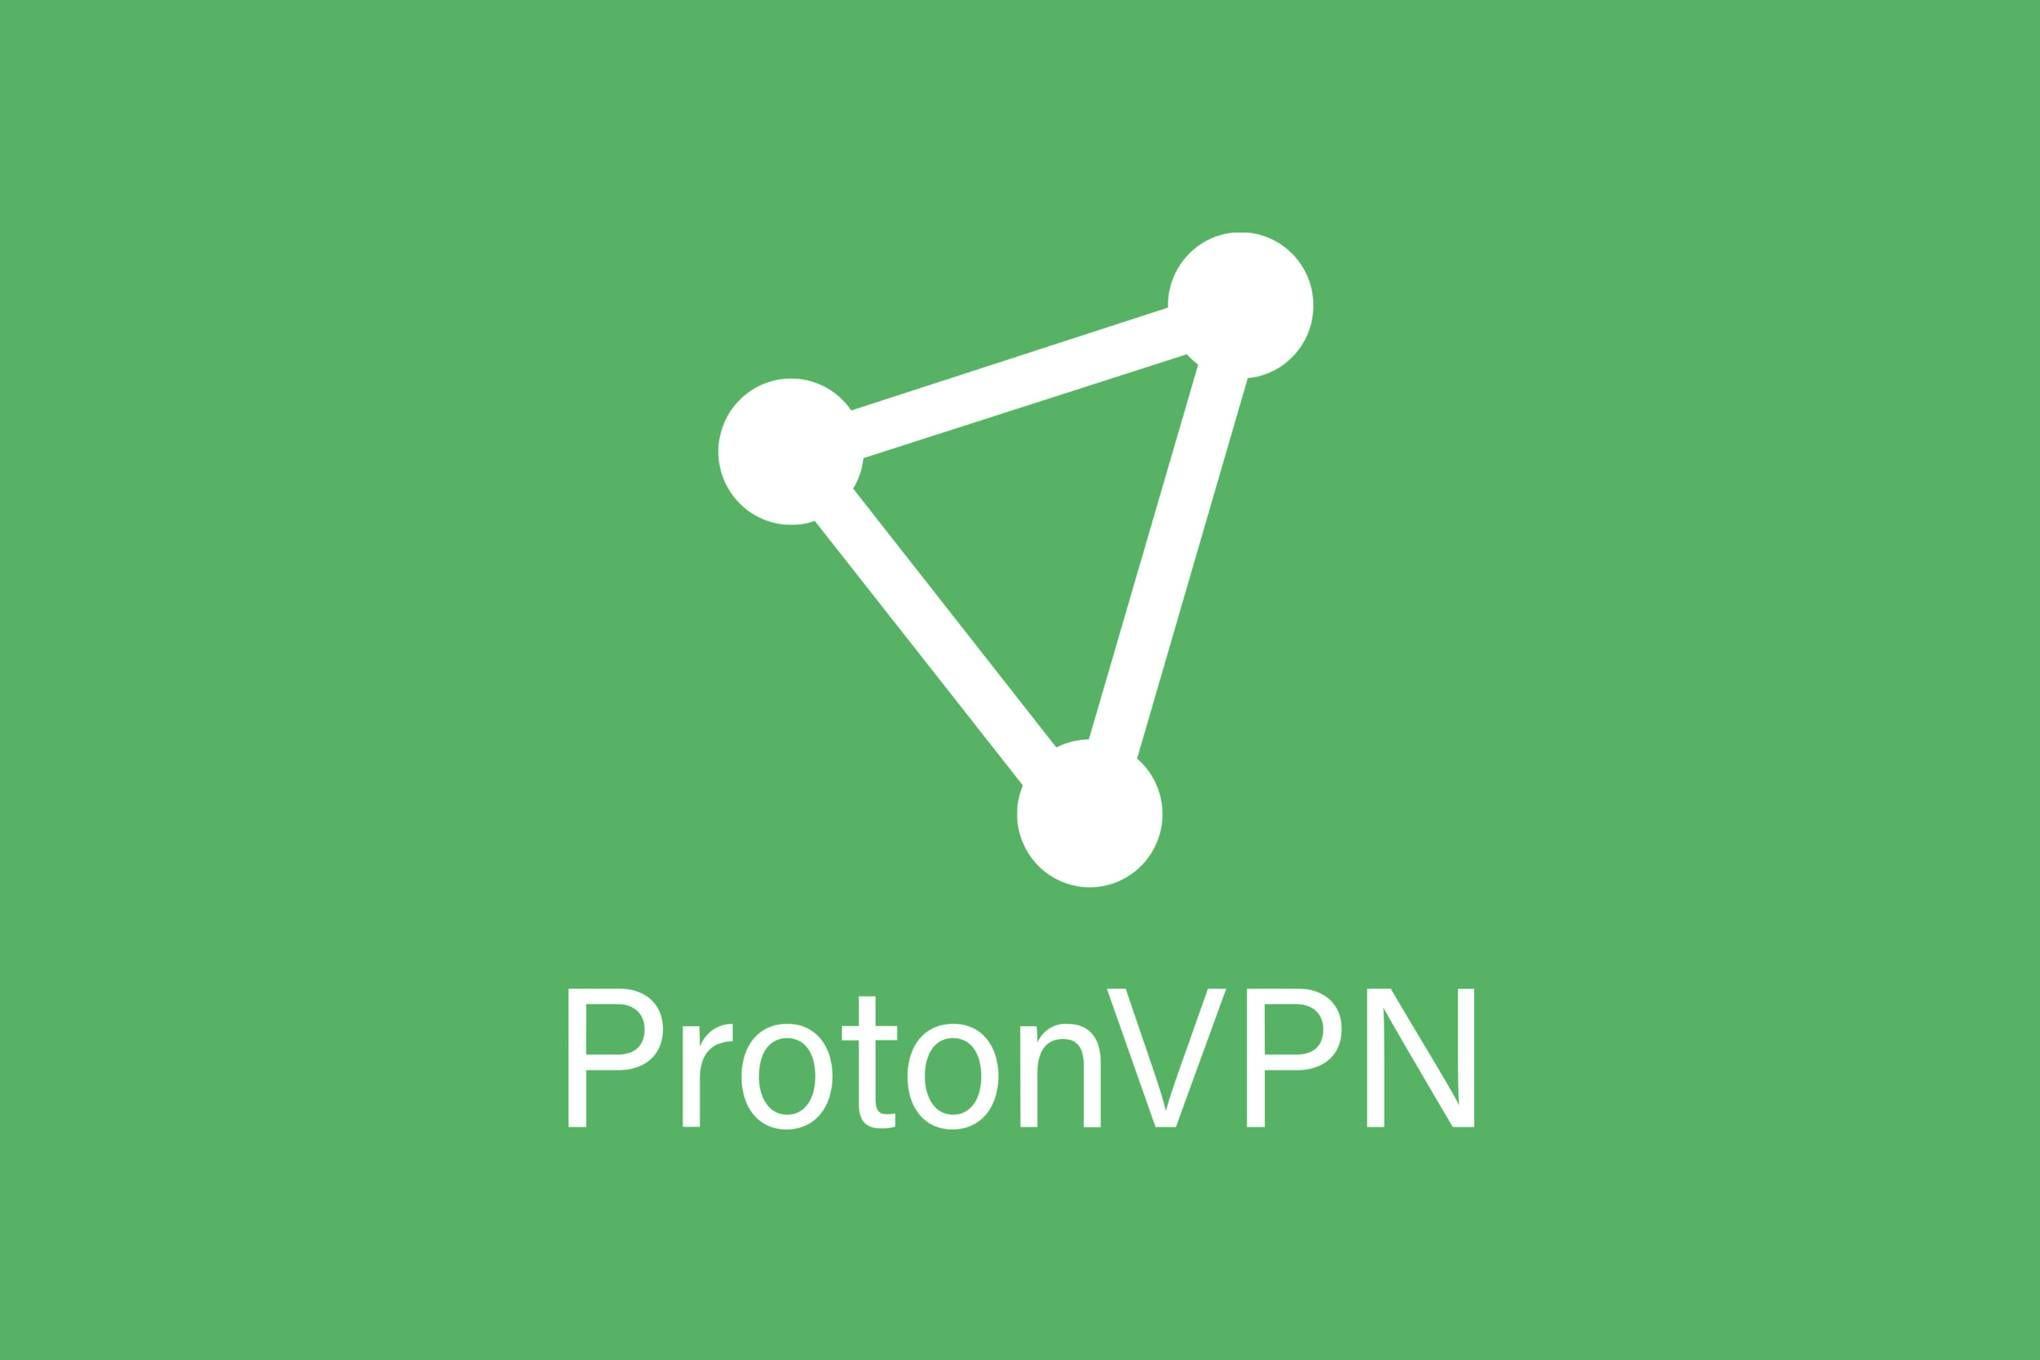 wired-uk-protonvpn